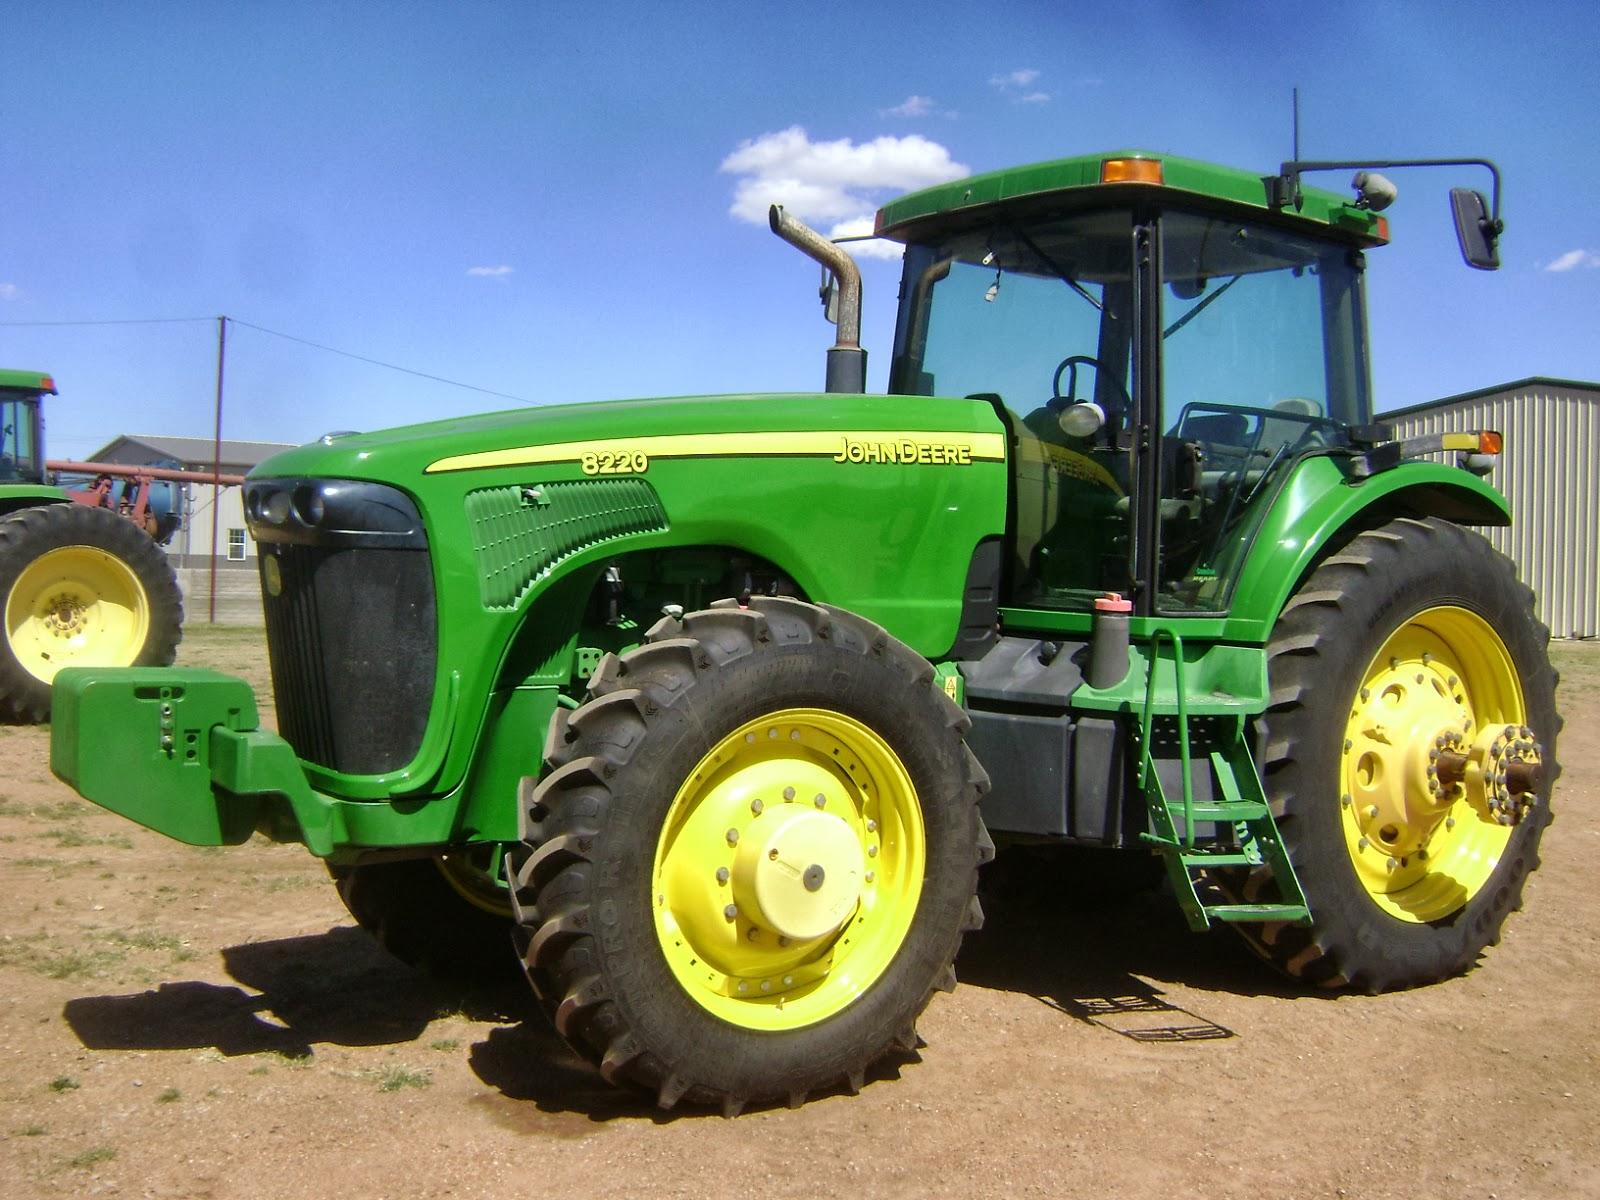 John Deere 8220 Tractor: John Deere 8000 - e-cighq.com